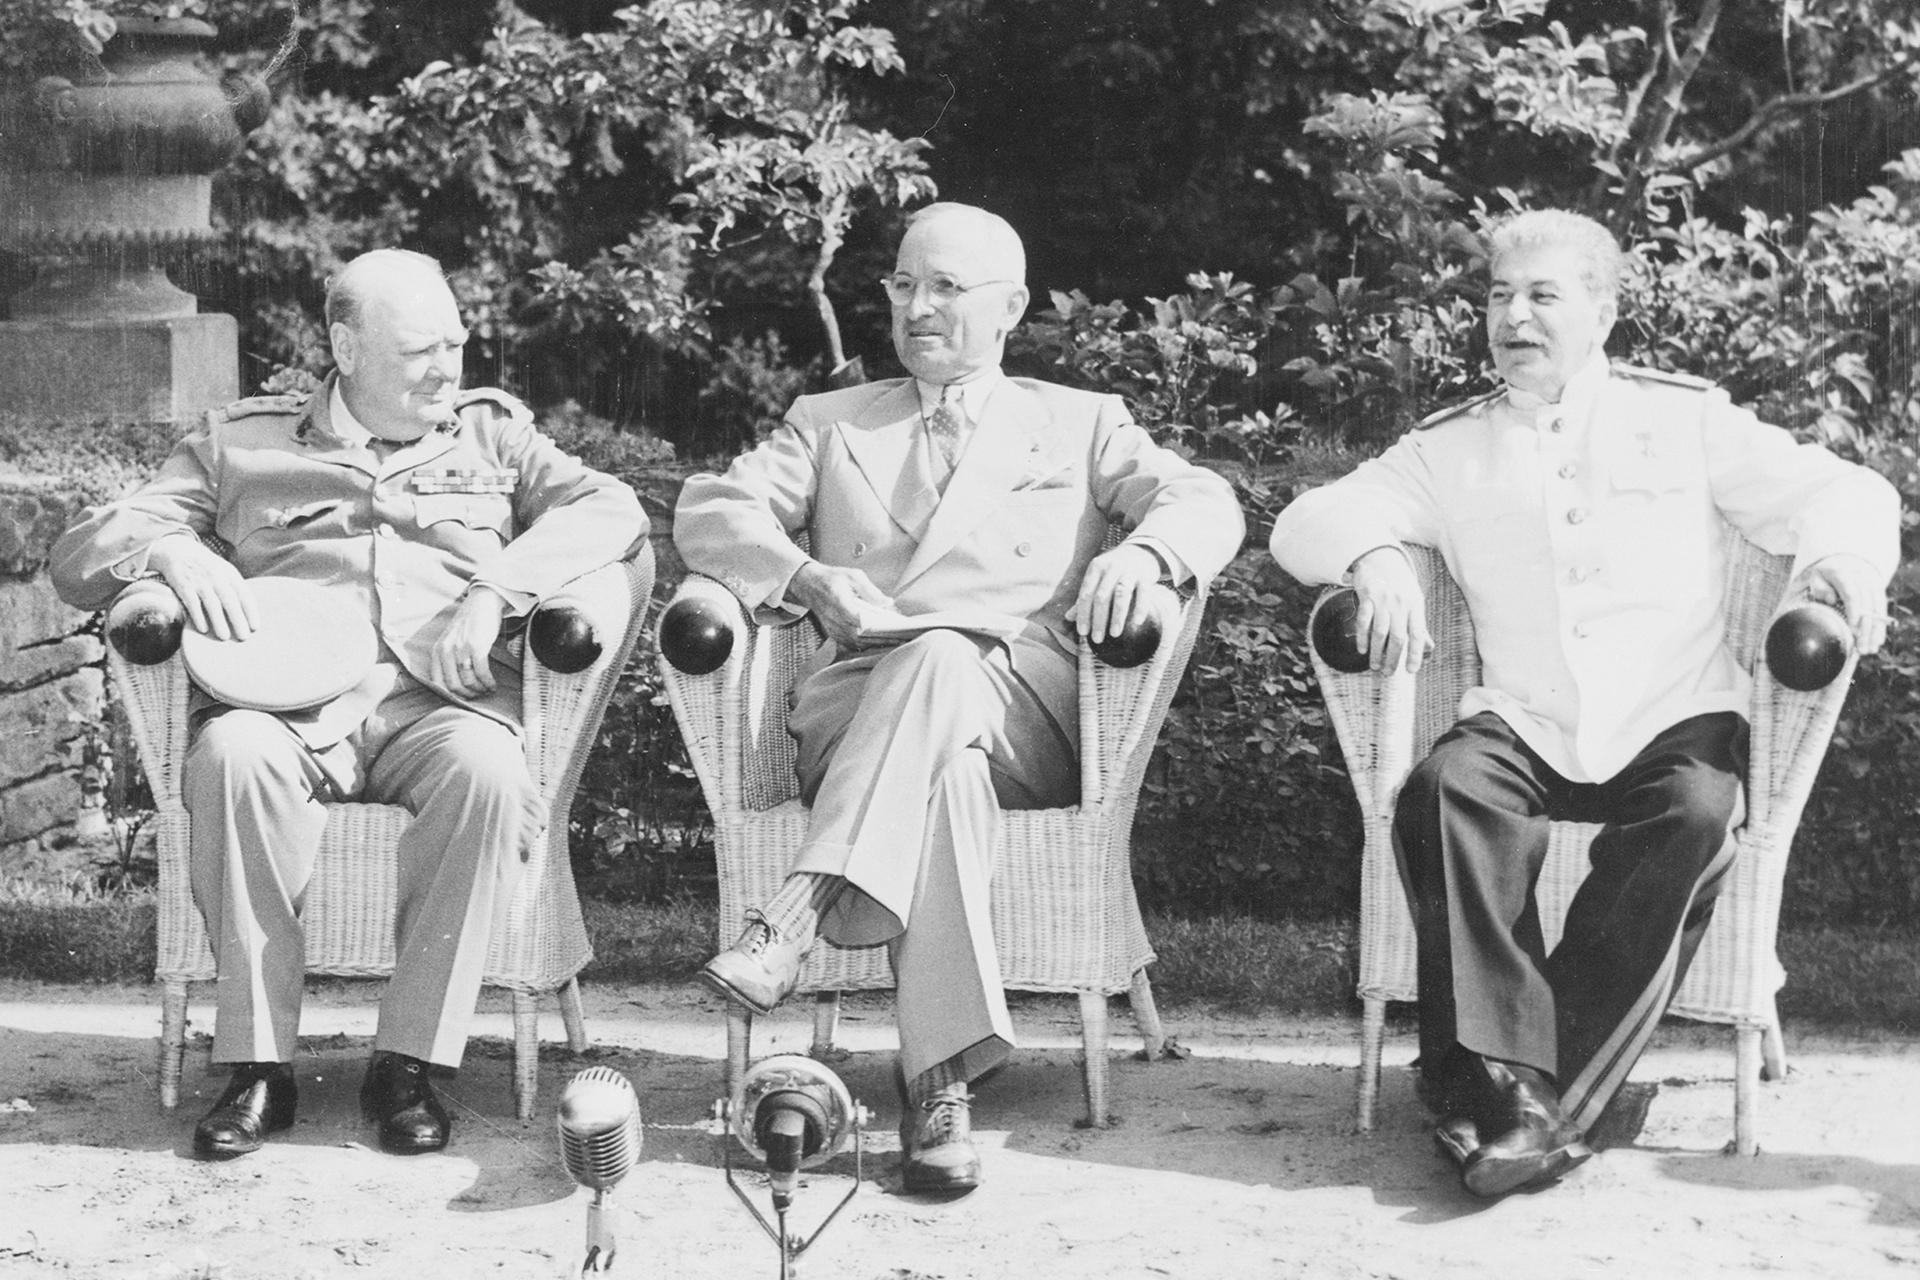 Winston Churchill, Harry S. Truman und Josef Stalin zu Beginn der Potsdam-Konferenz, Foto: U. S. Army Signal Corps/ Courtesy of Harry S. Truman Library